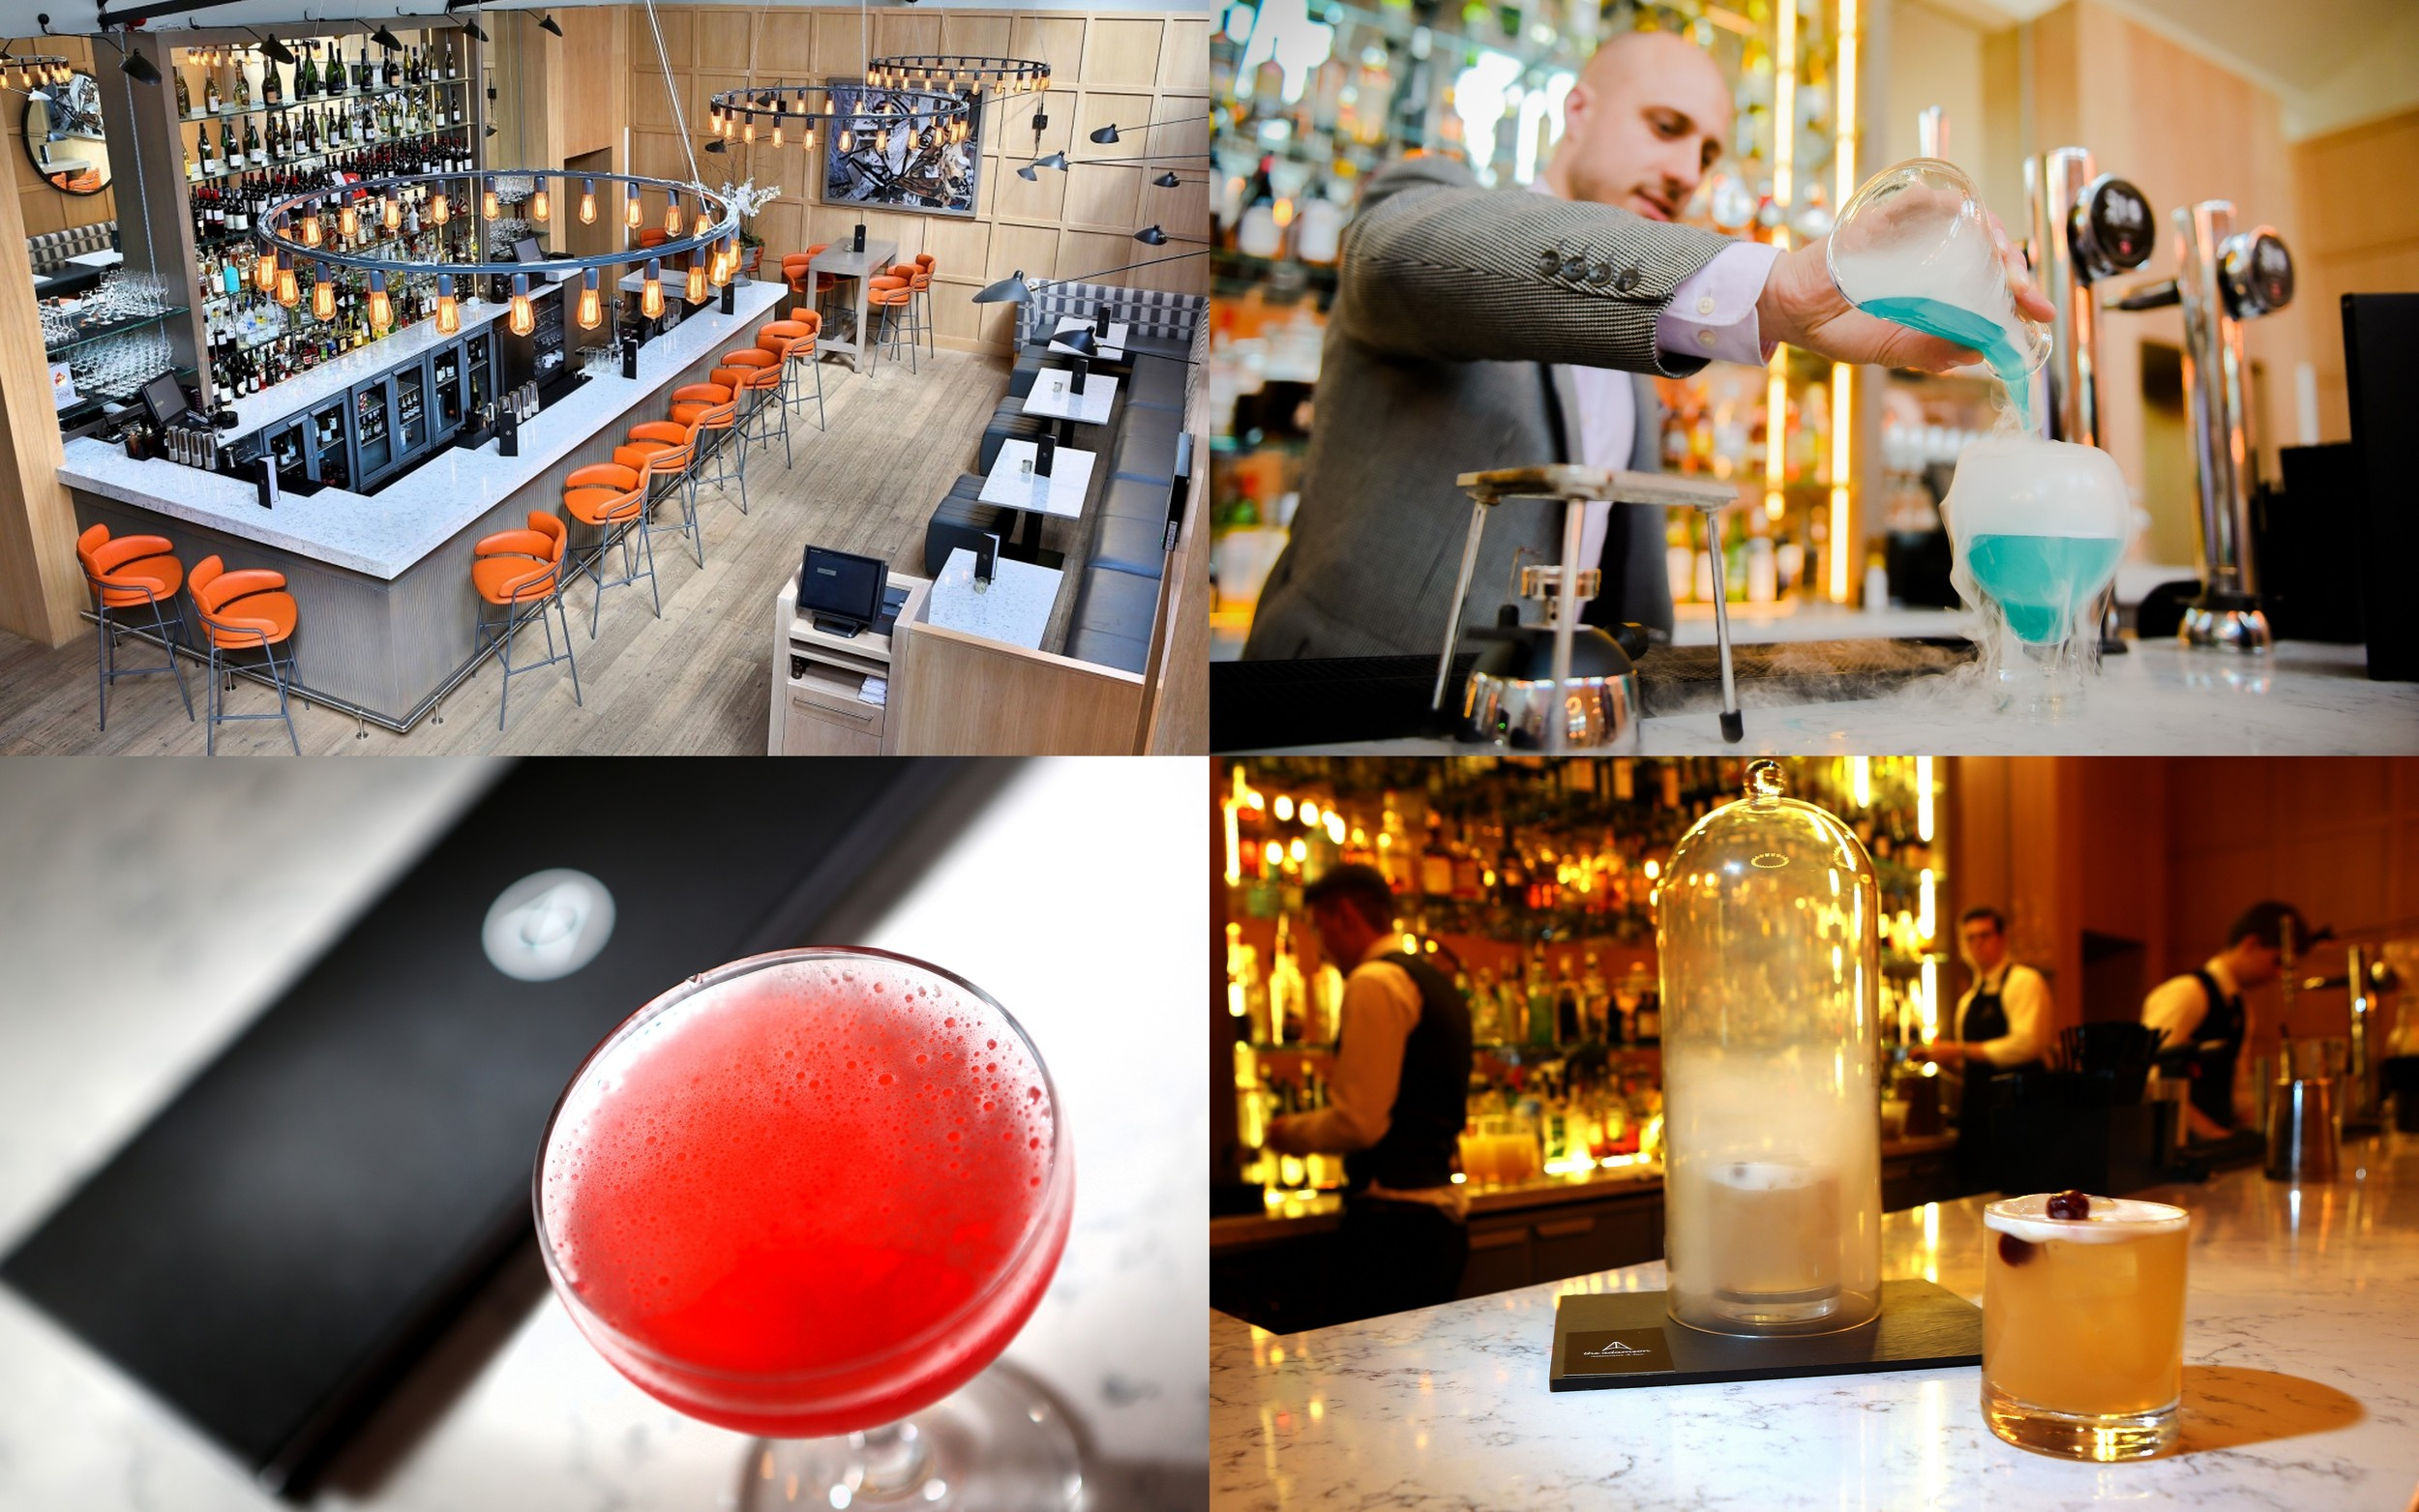 The adamson bar - South Street